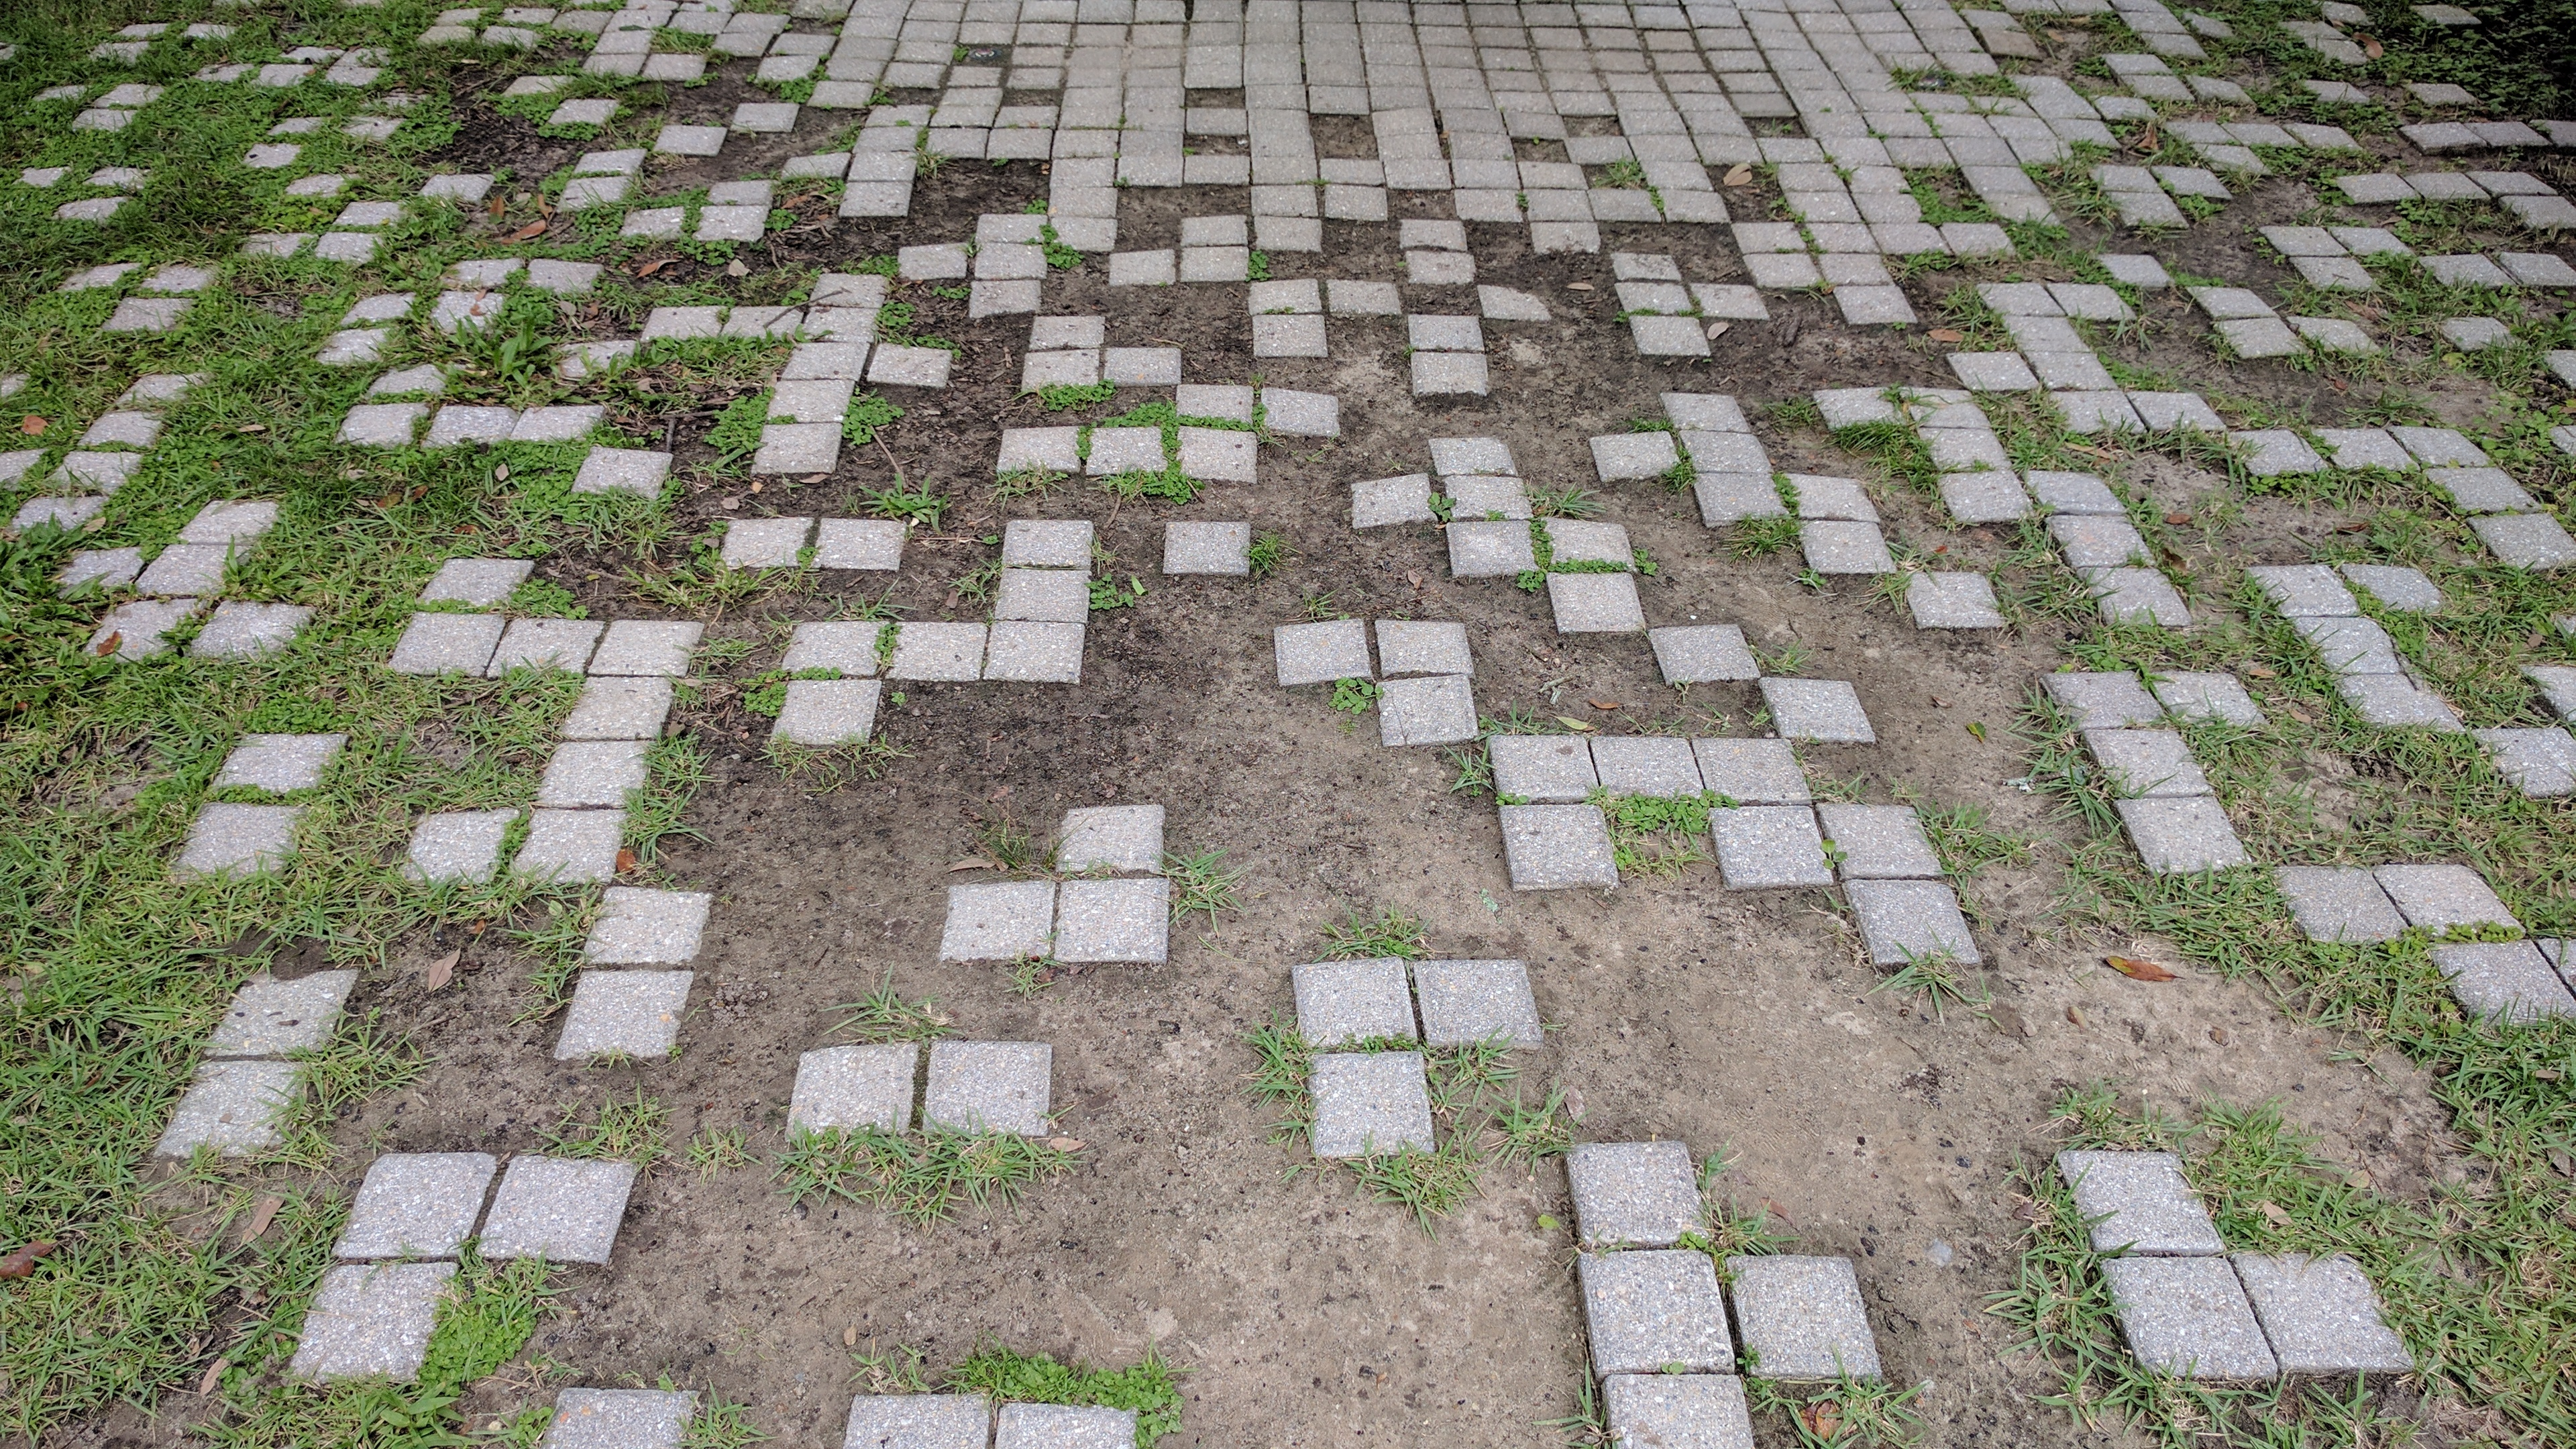 tetris-block-art-falling-into-place.jpg